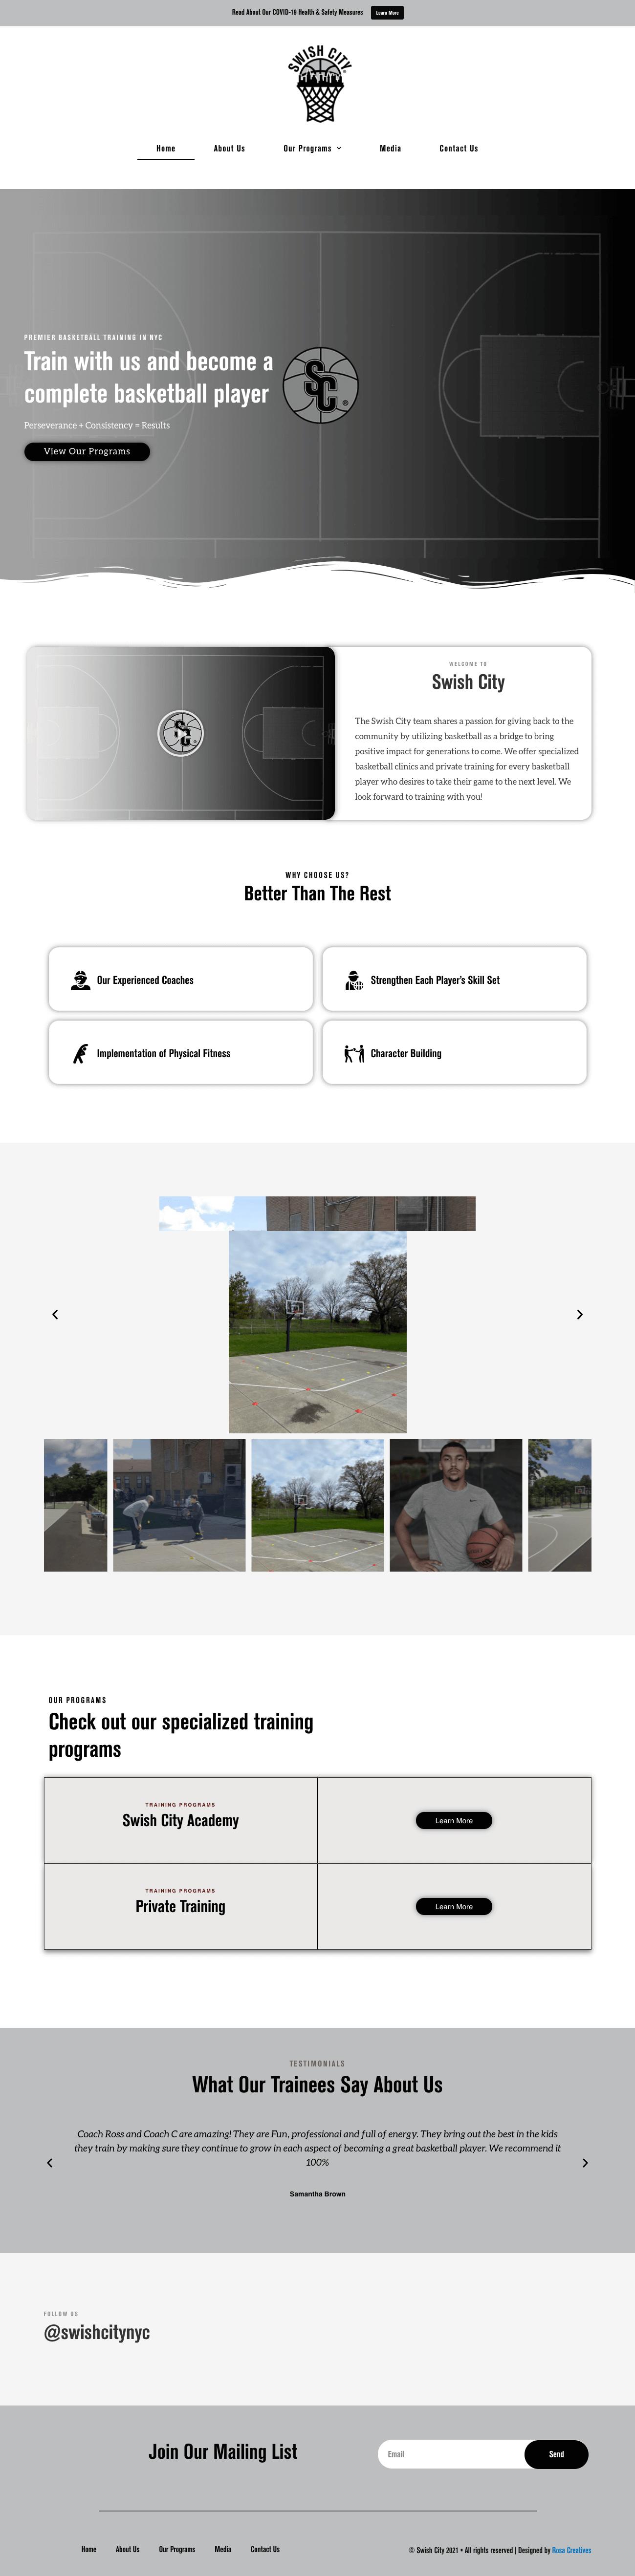 Web Design In Westchester